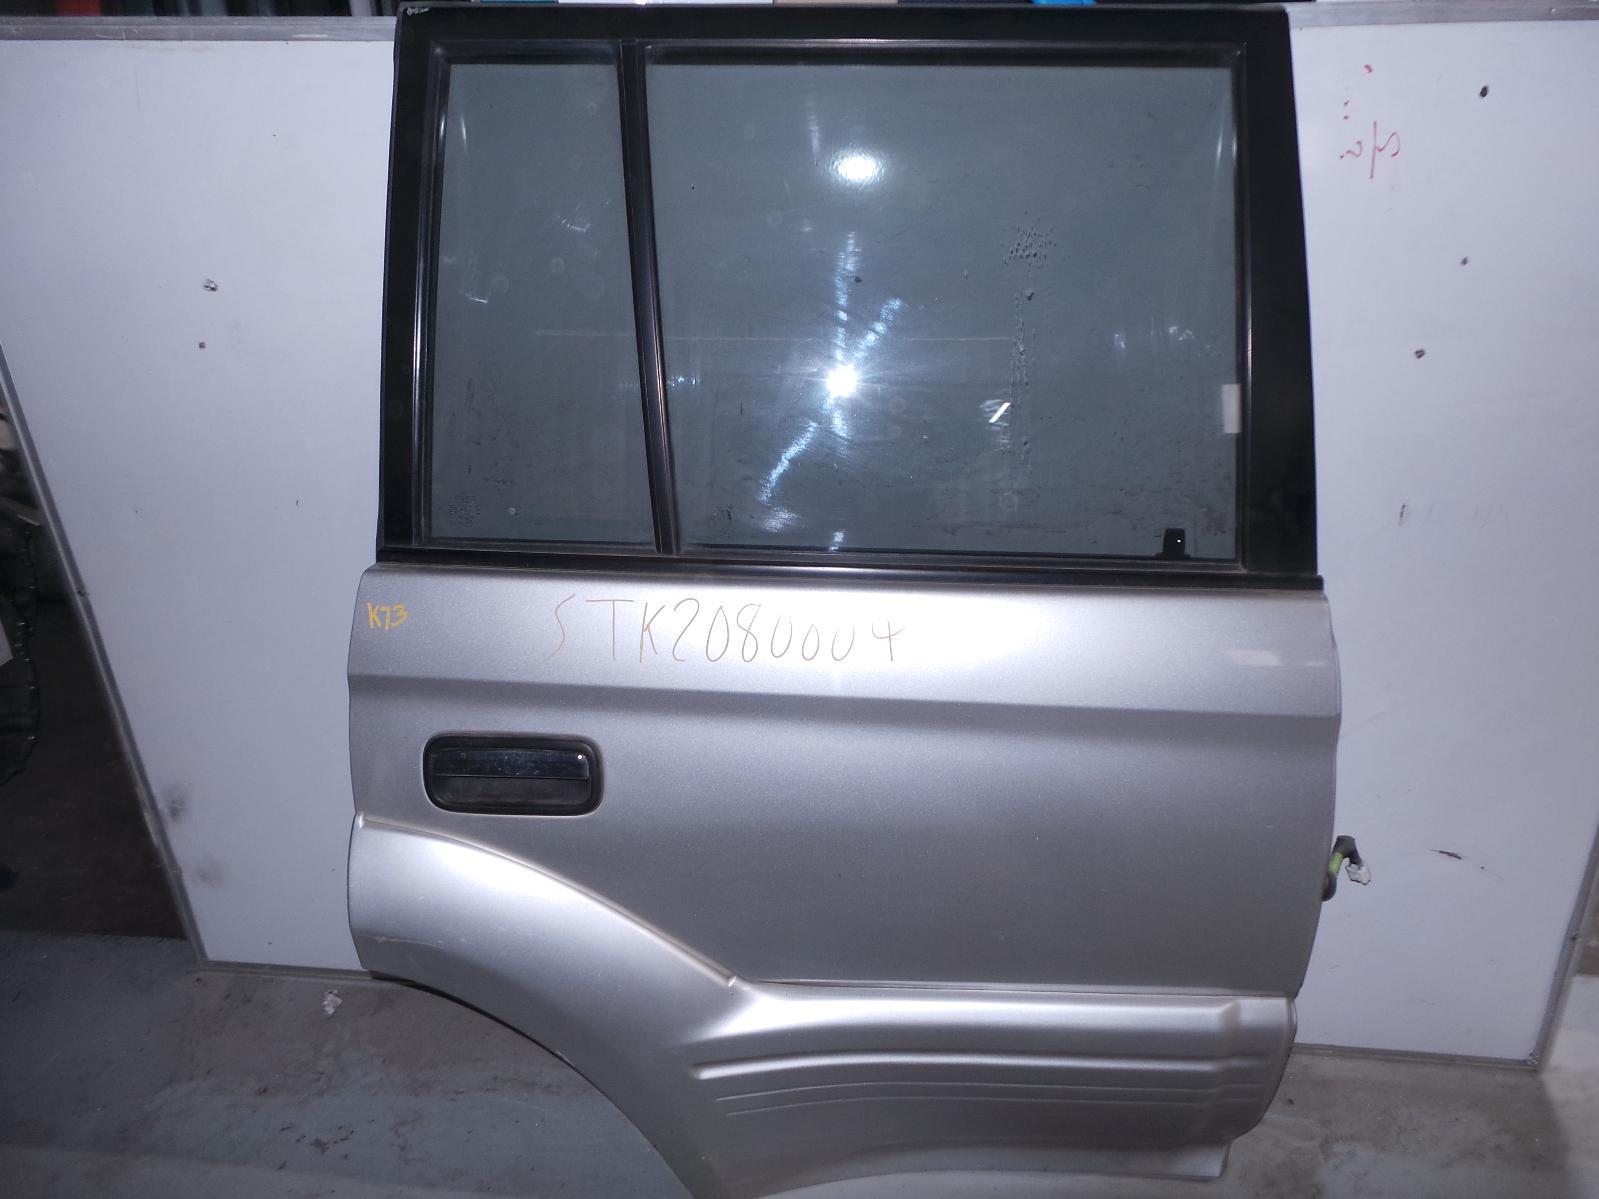 TOYOTA PRADO, RIGHT_REAR_DOOR_SLIDING, 95 SERIES, W/ MOULD, 07/96-01/03